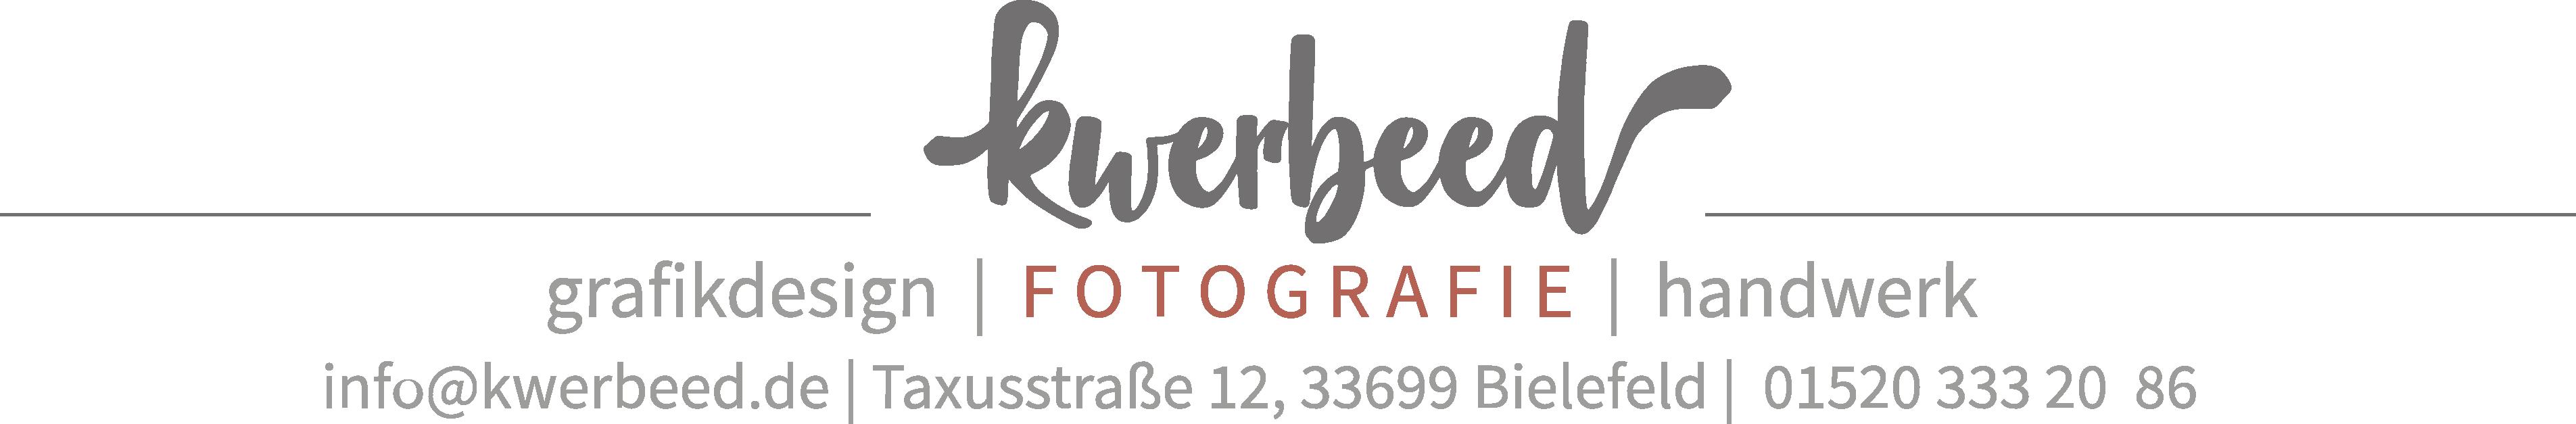 kwerbeed | FOTOGRAFIE